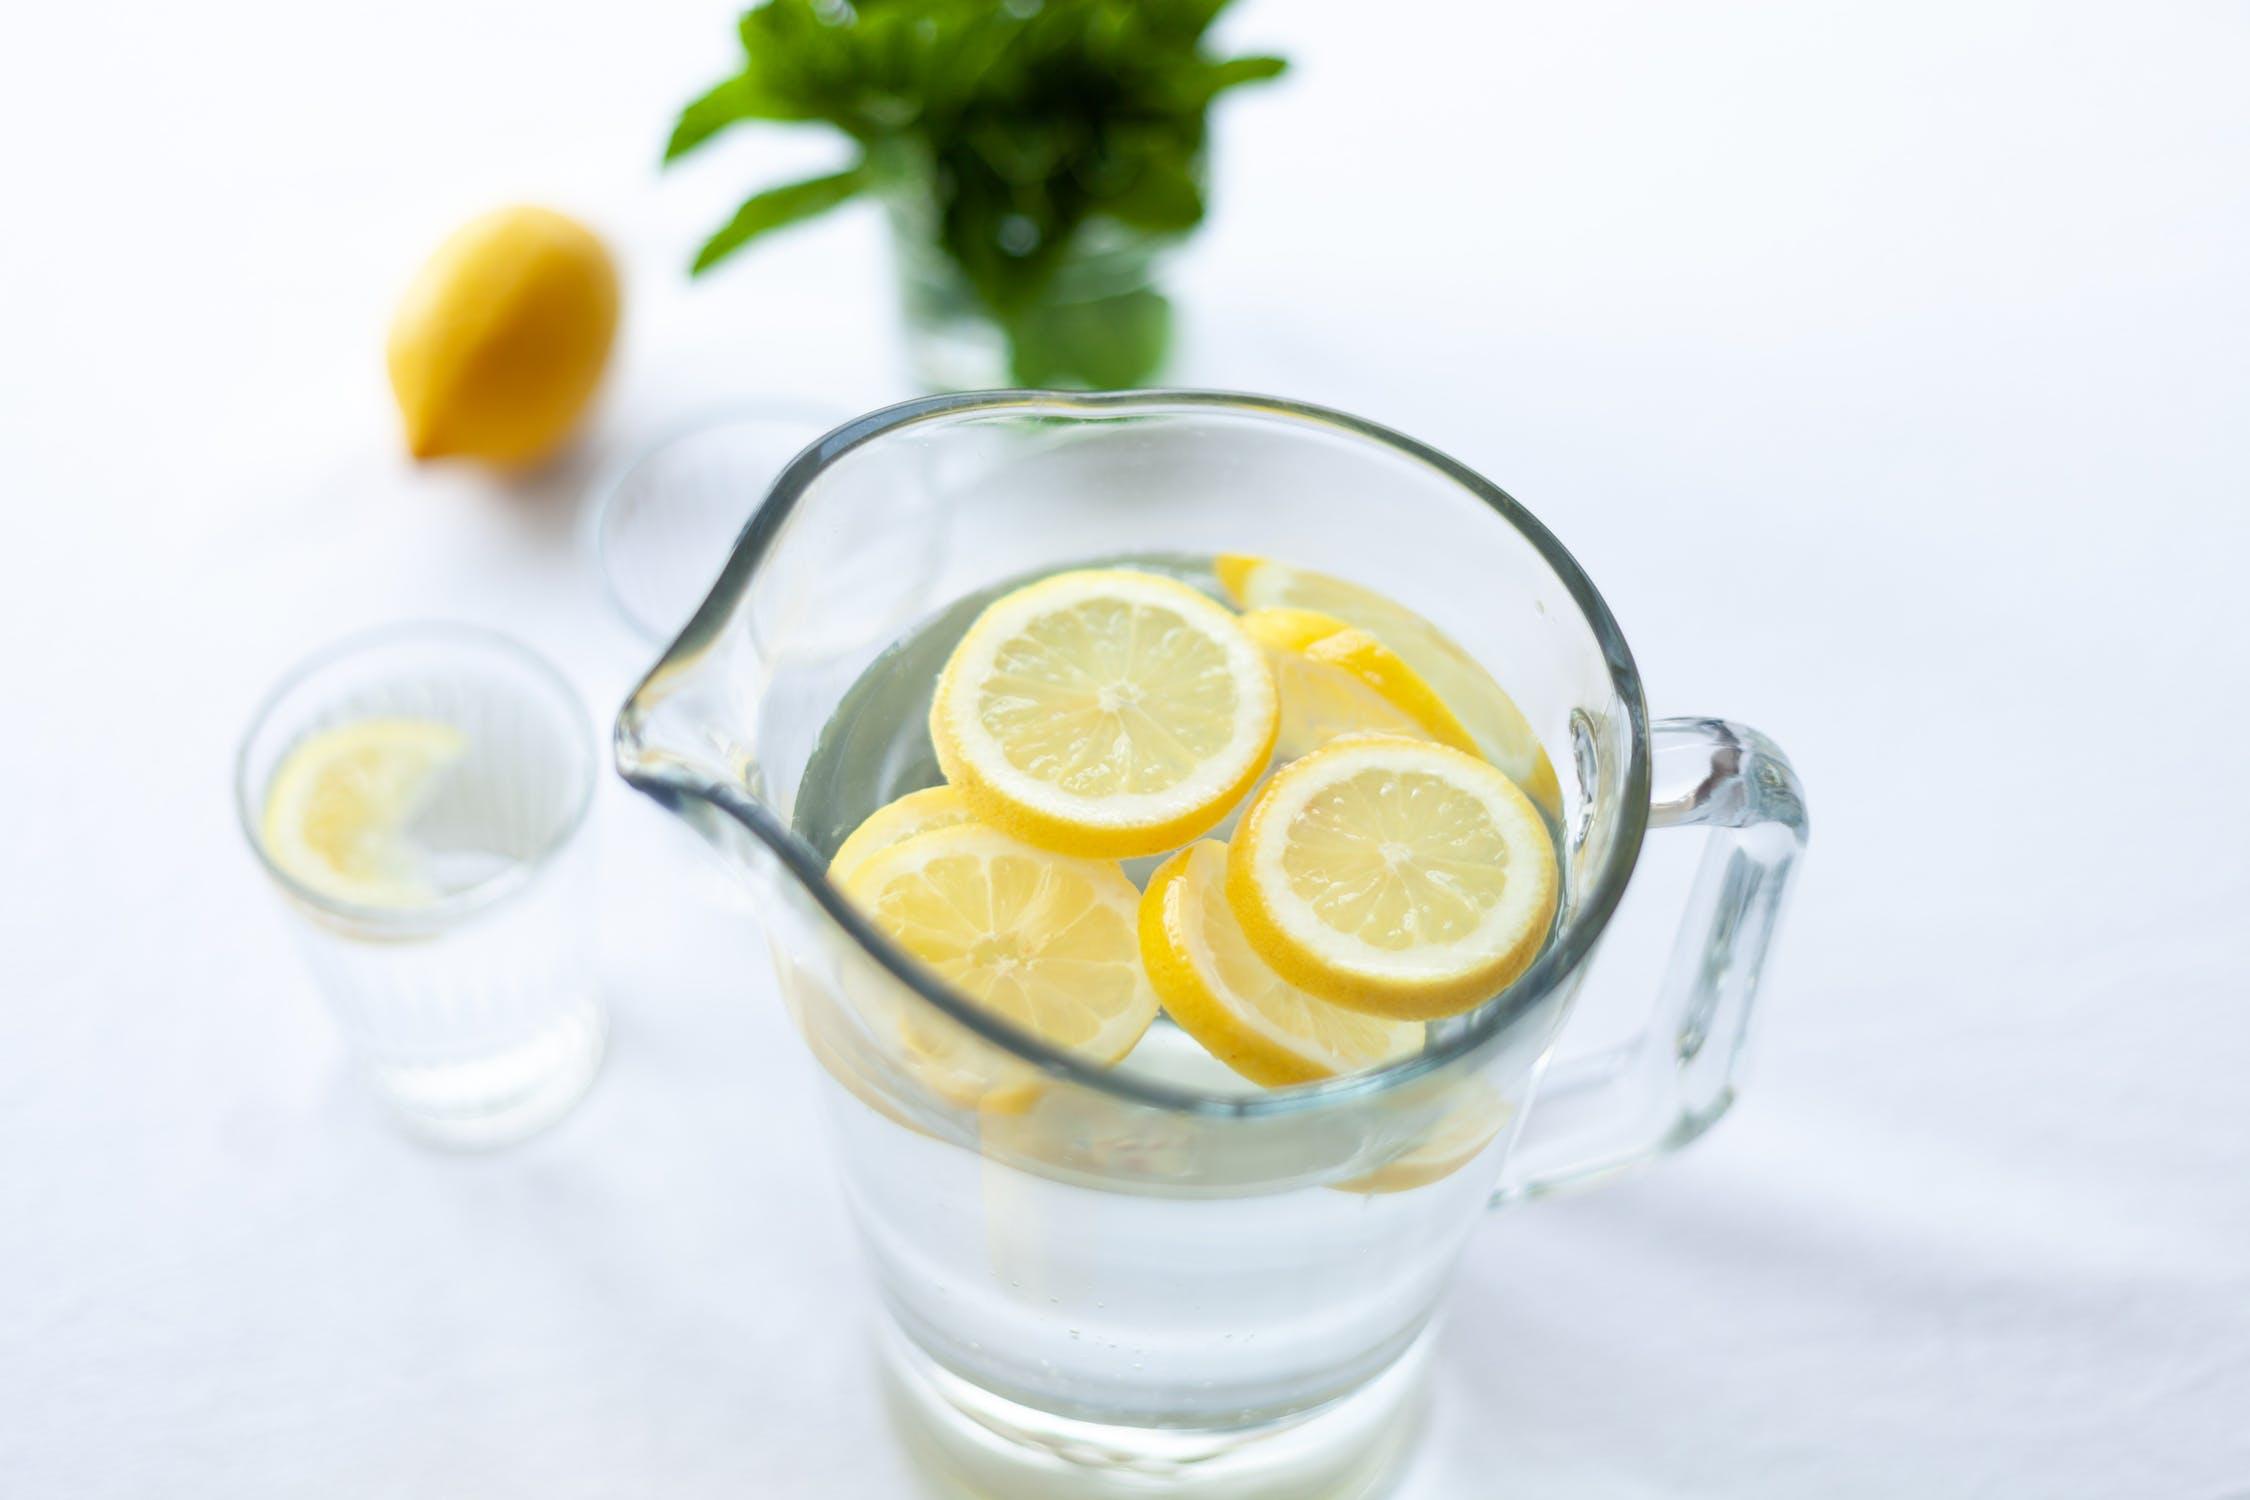 Apa cu lamaie - Cum se prepara si ce beneficii aduce sanatatii organismului